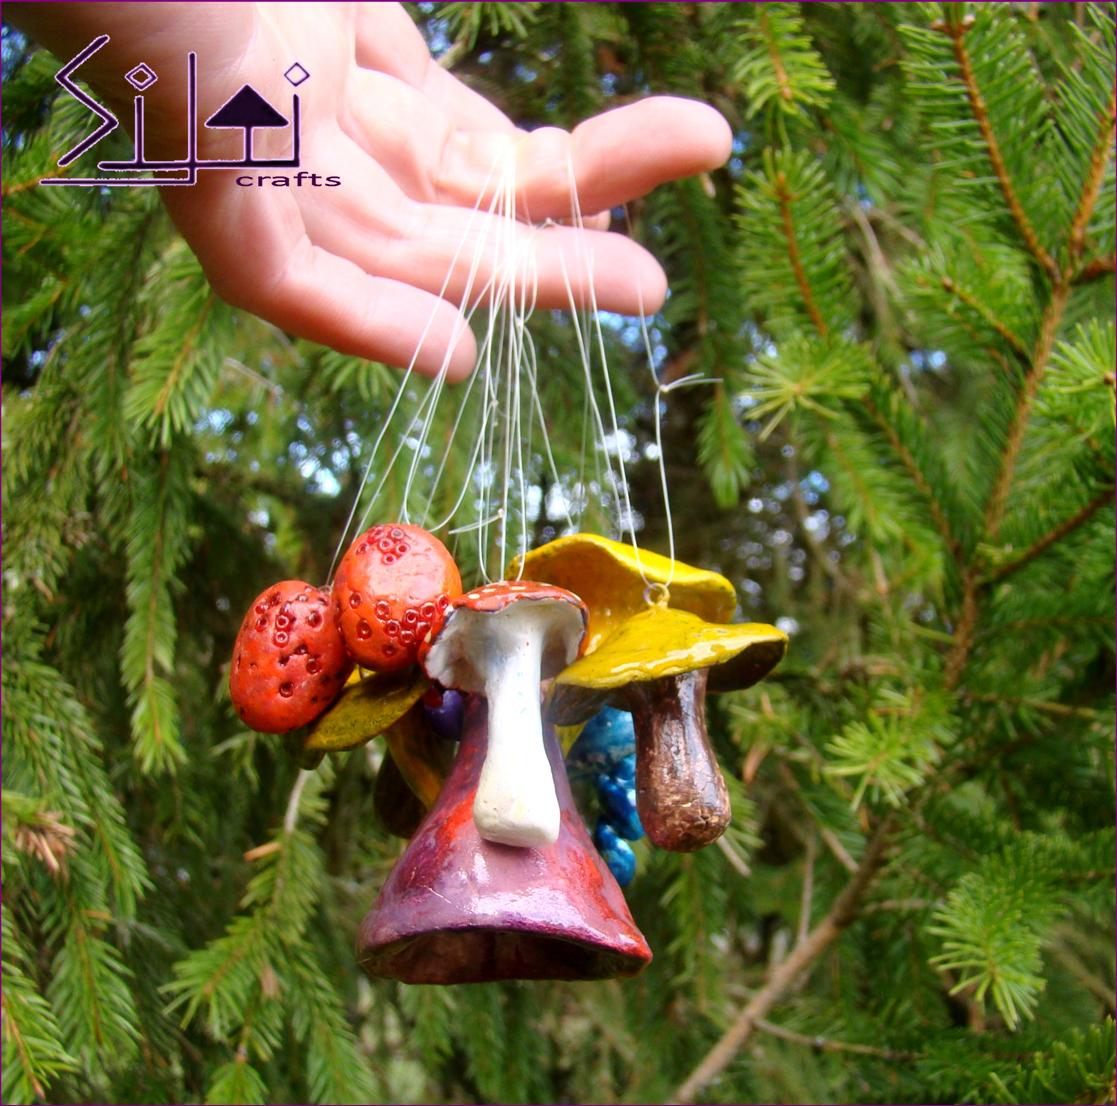 ornaments christmas decorations mushrooms handsculpted bohemian yule woodlands